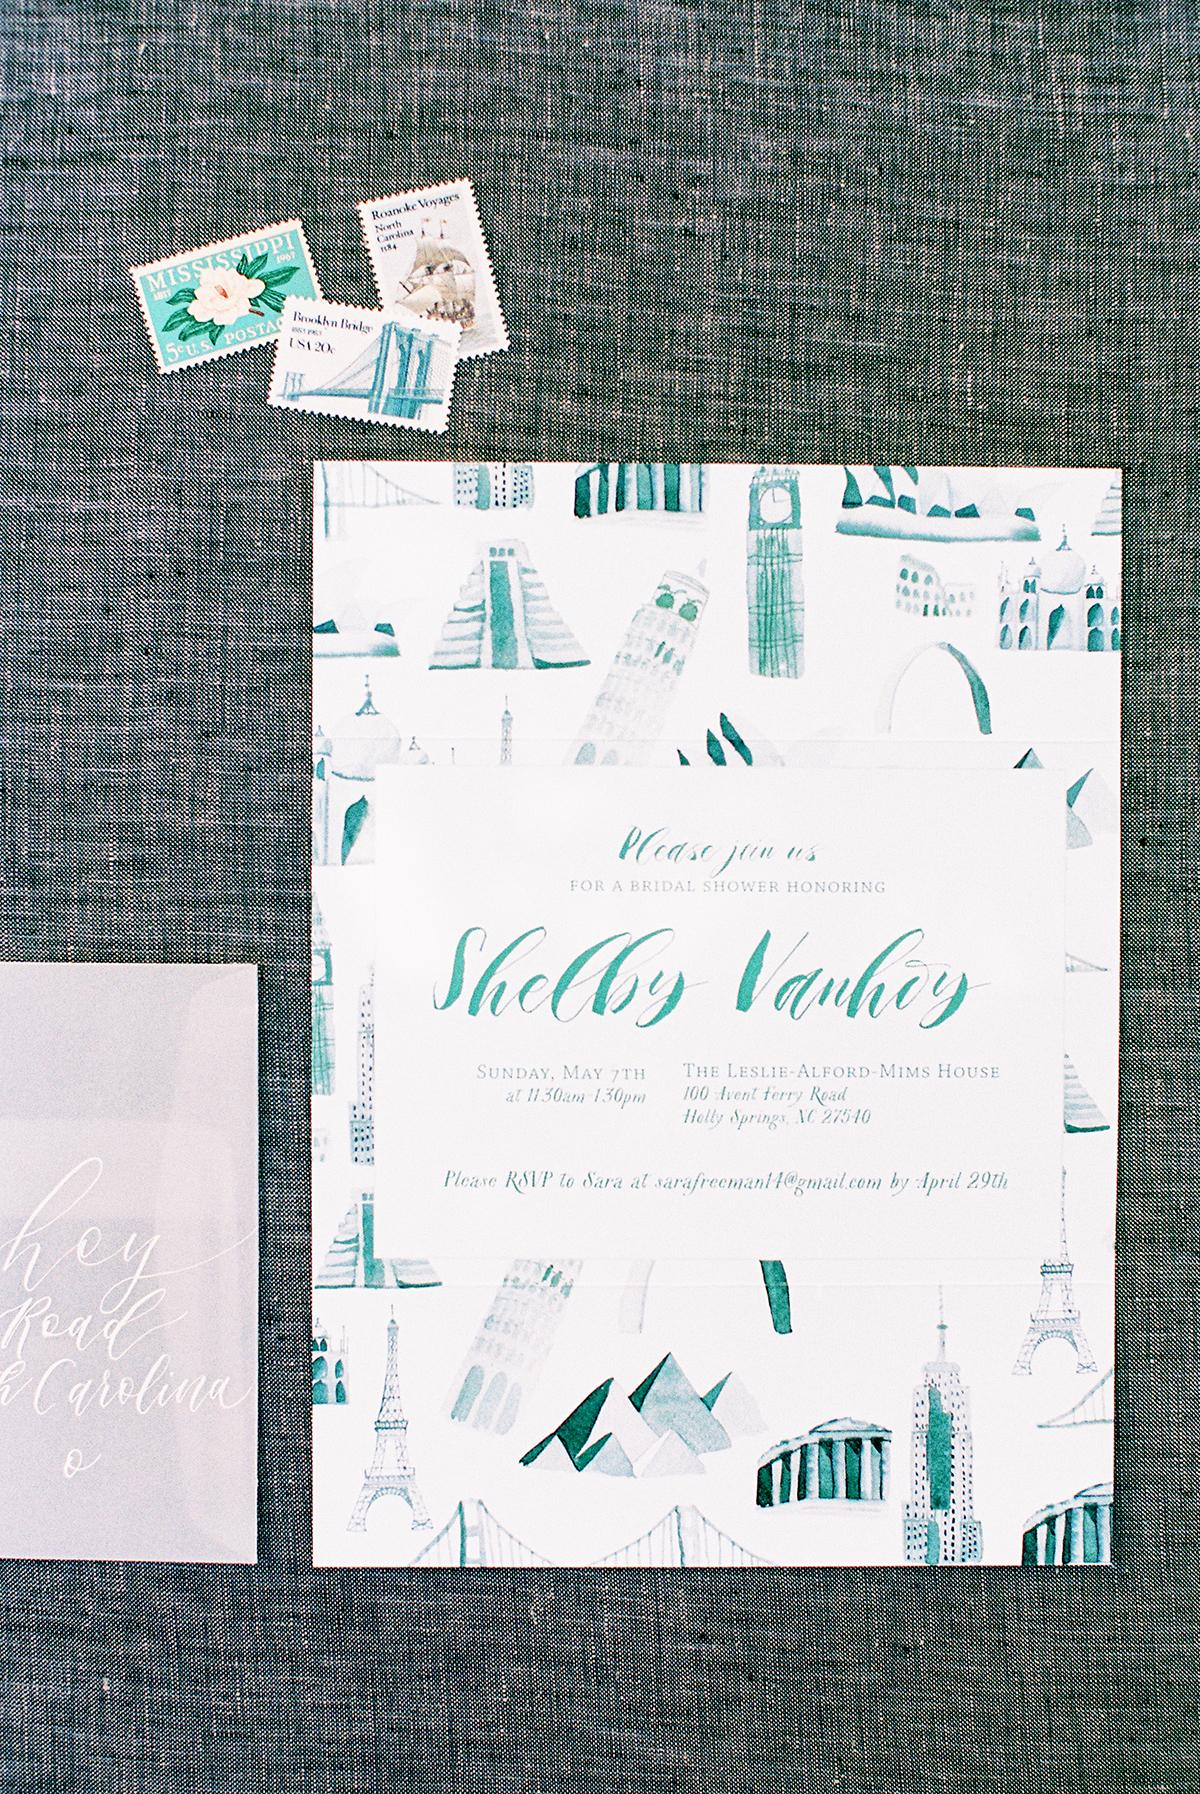 wedding invitation featuring different landmarks